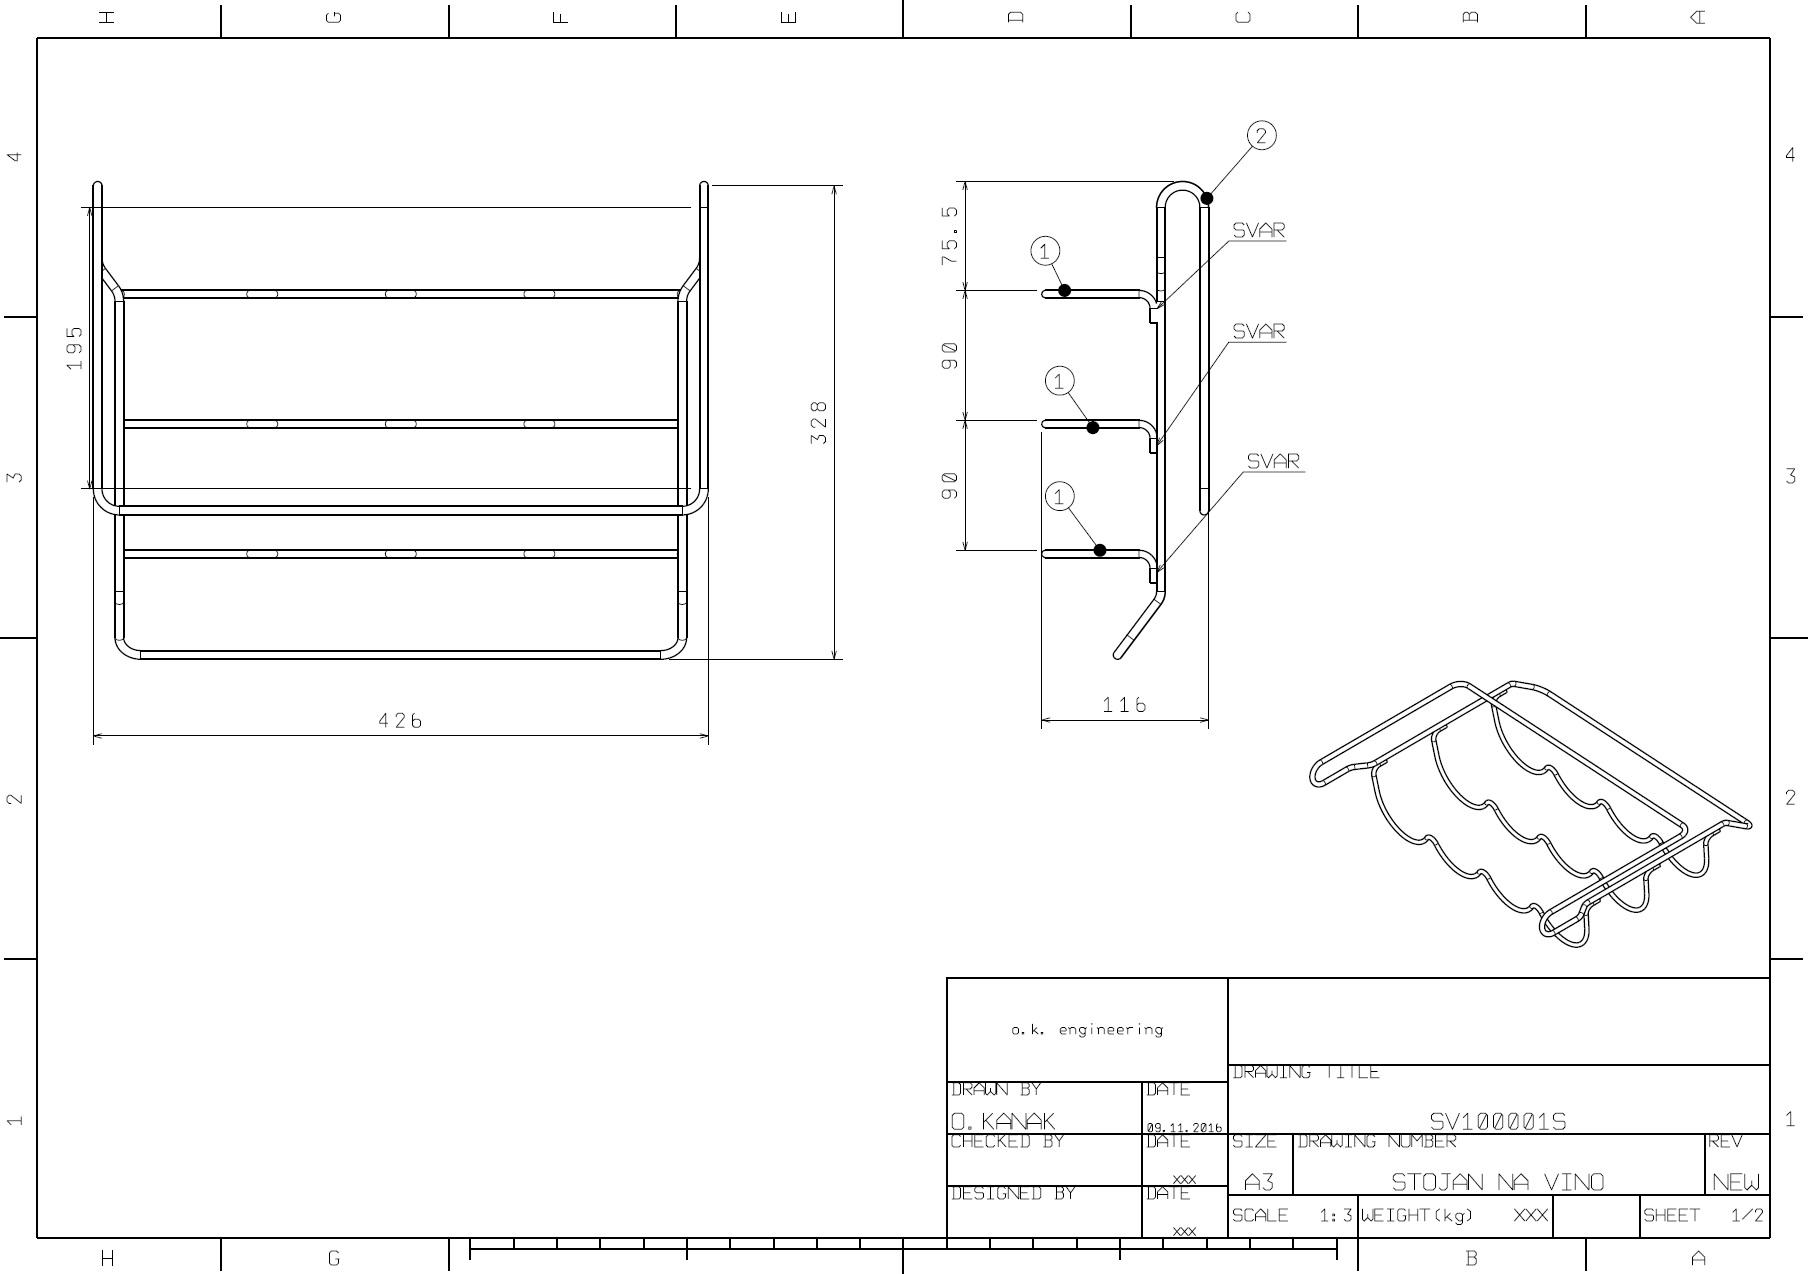 Design Cad Modeling Development 3d Construction 3d Printing Brno